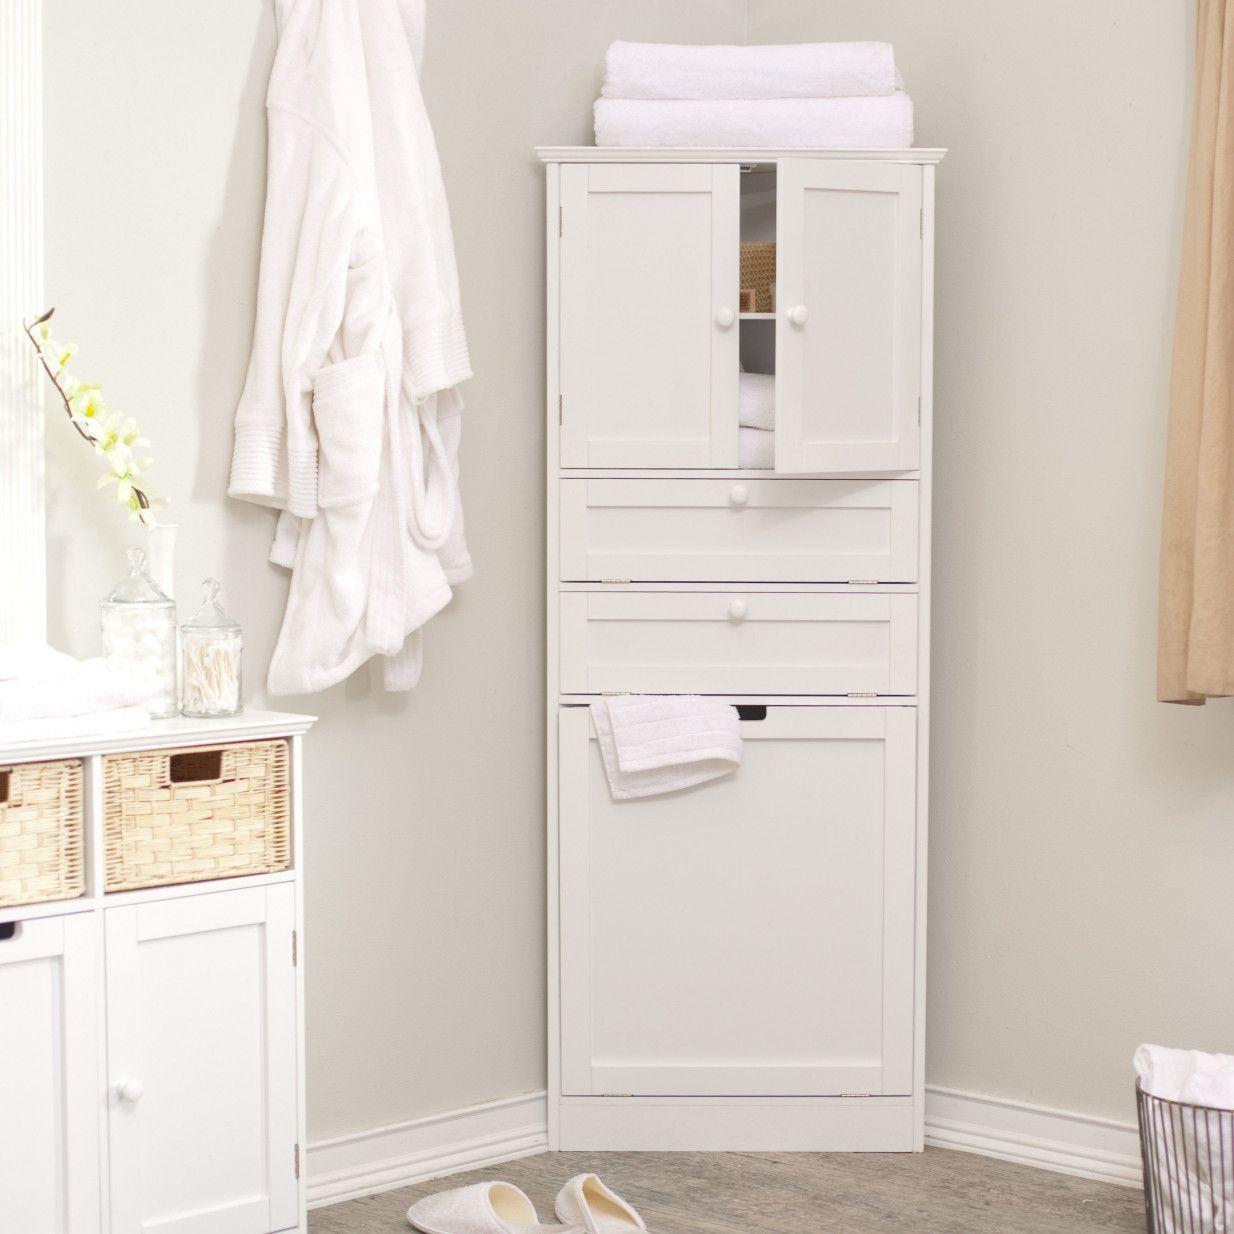 2018 White Bathroom Corner Wall Cabinet - Best Interior House Paint ...